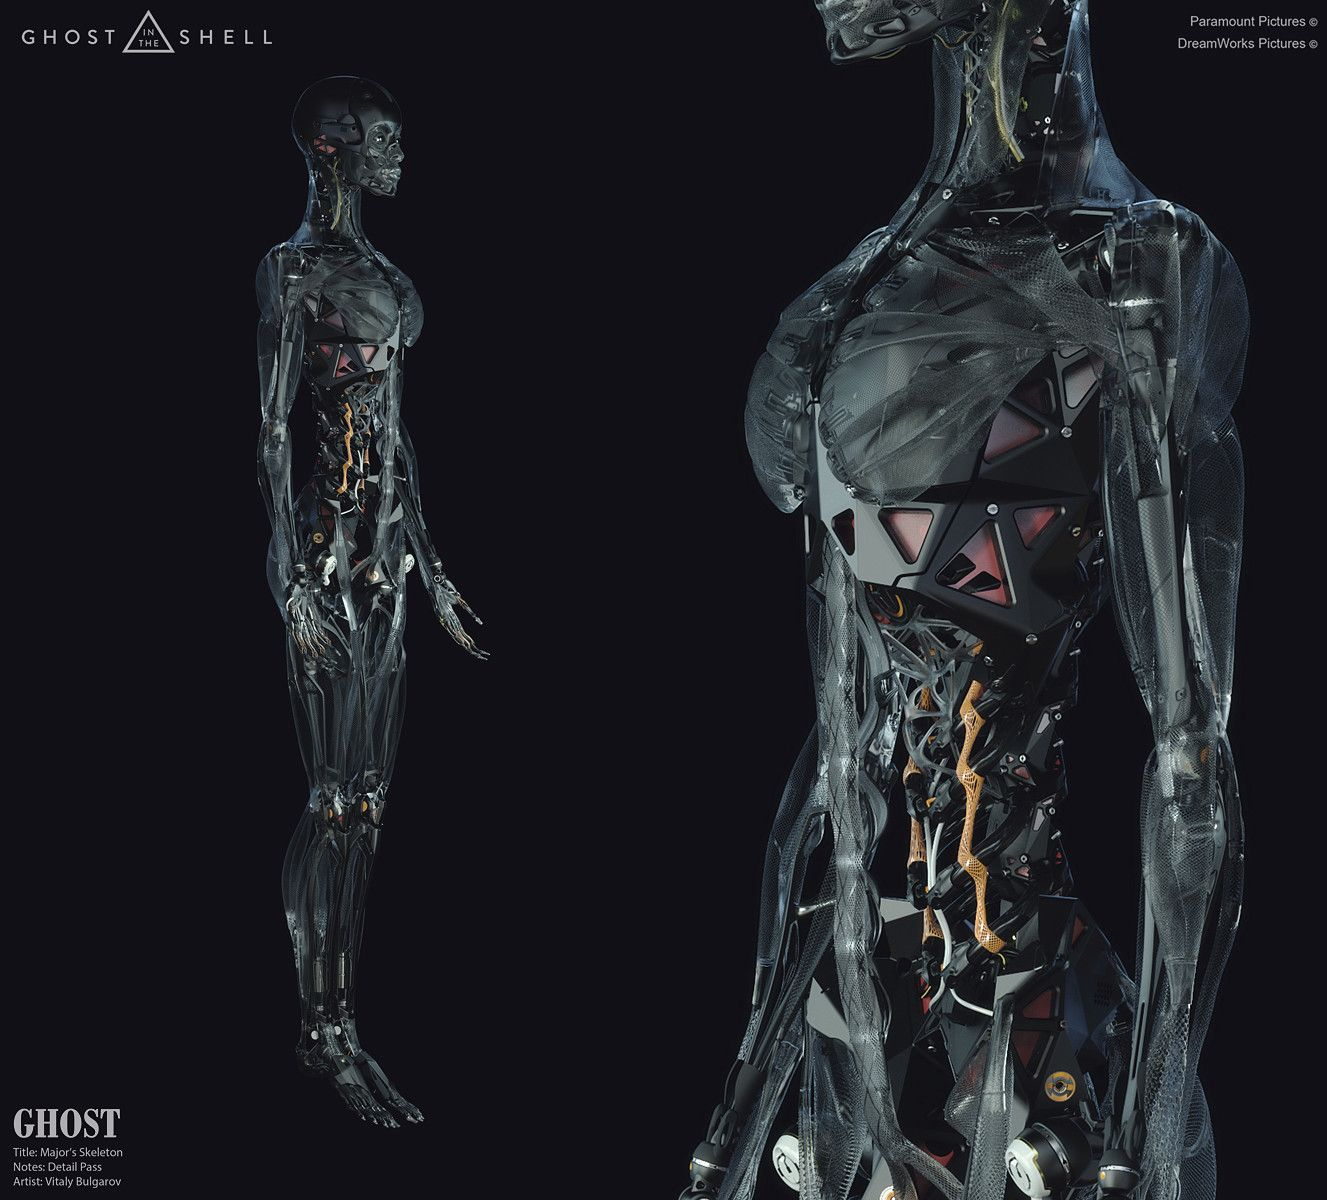 Artstation Concept Design Work For Ghost In The Shell Film Vitaly Bulgarov Ghost In The Shell Female Cyborg Robots Concept